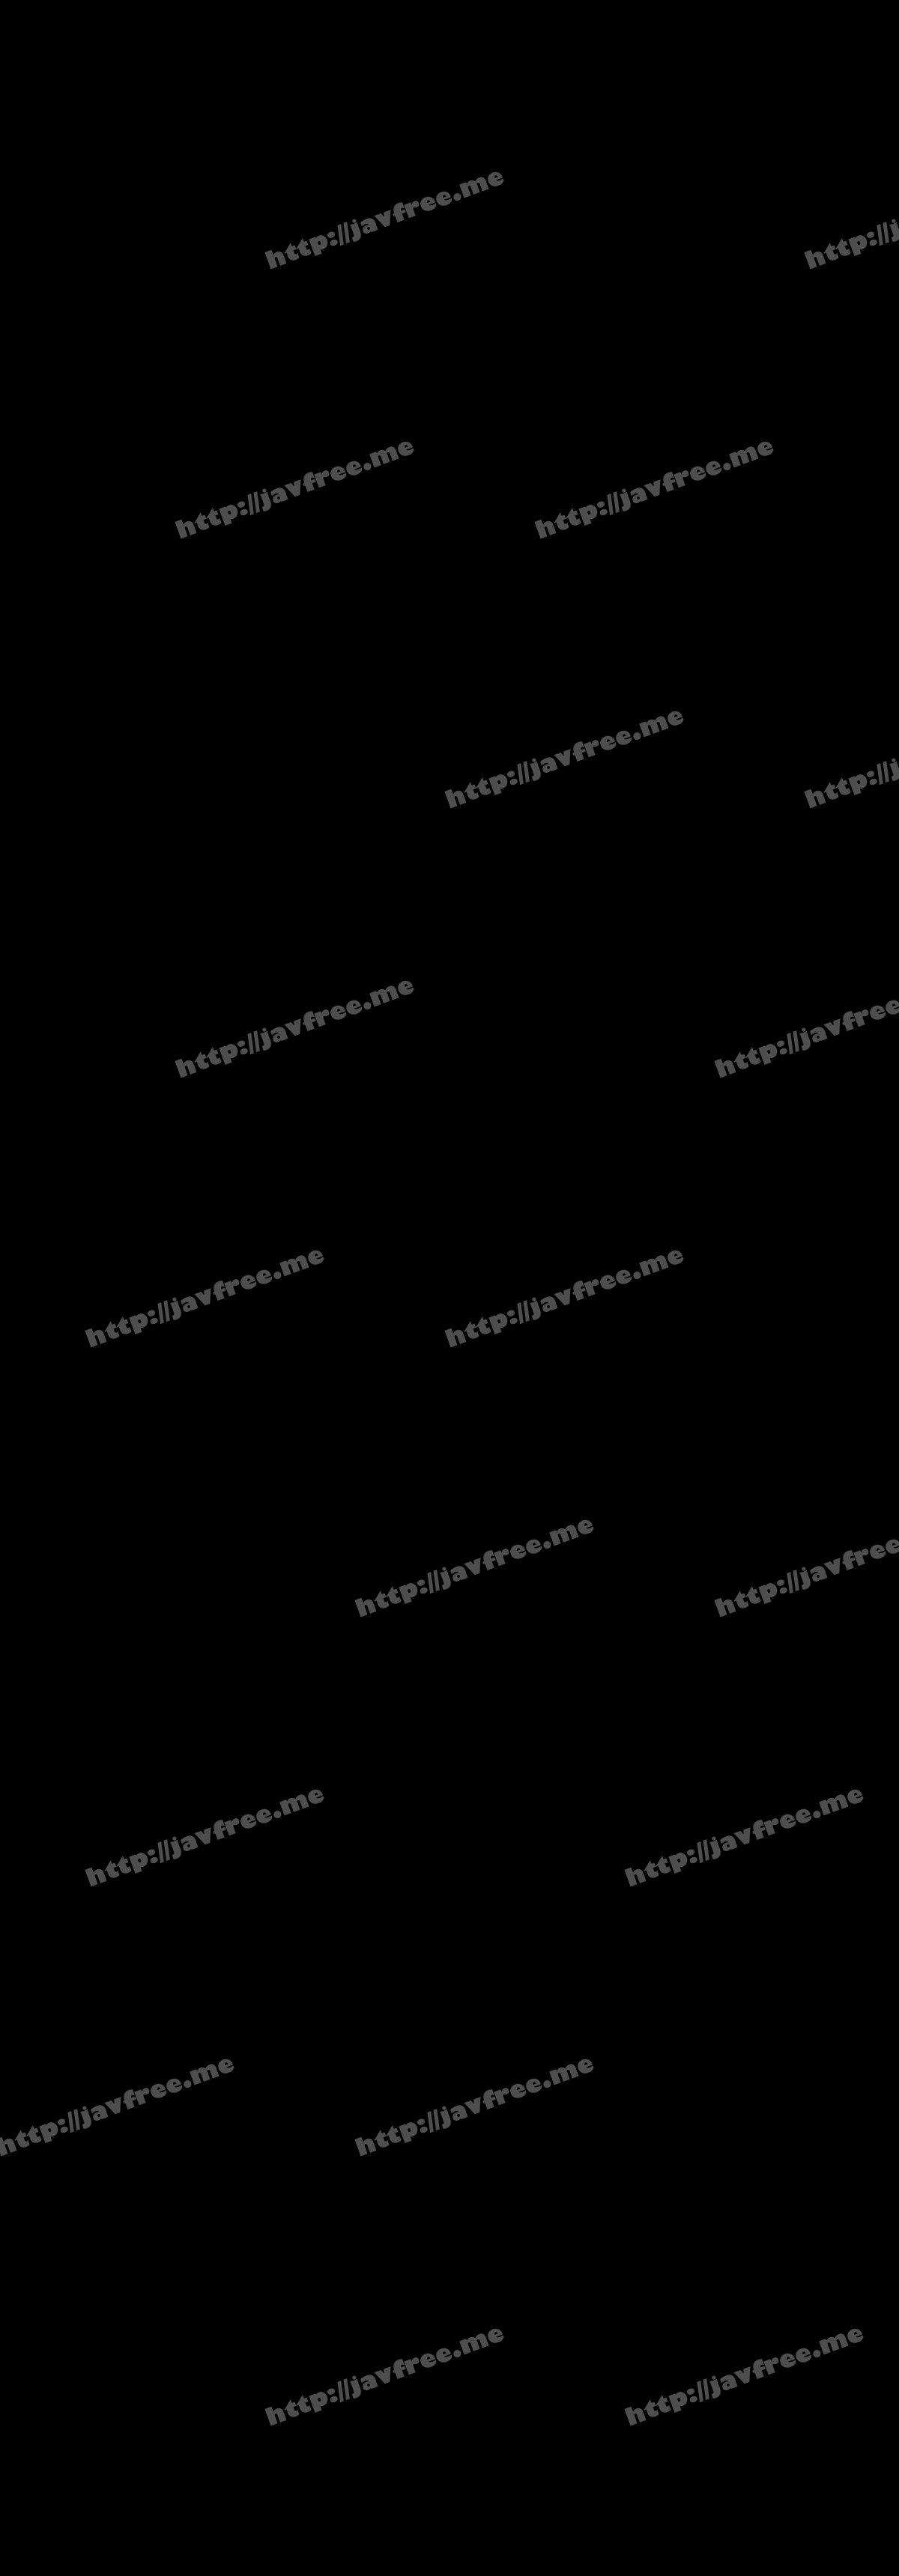 [HD][JRZD-891] 初撮り人妻ドキュメント 藤本遥香 - image JRZD-891-1080p on https://javfree.me